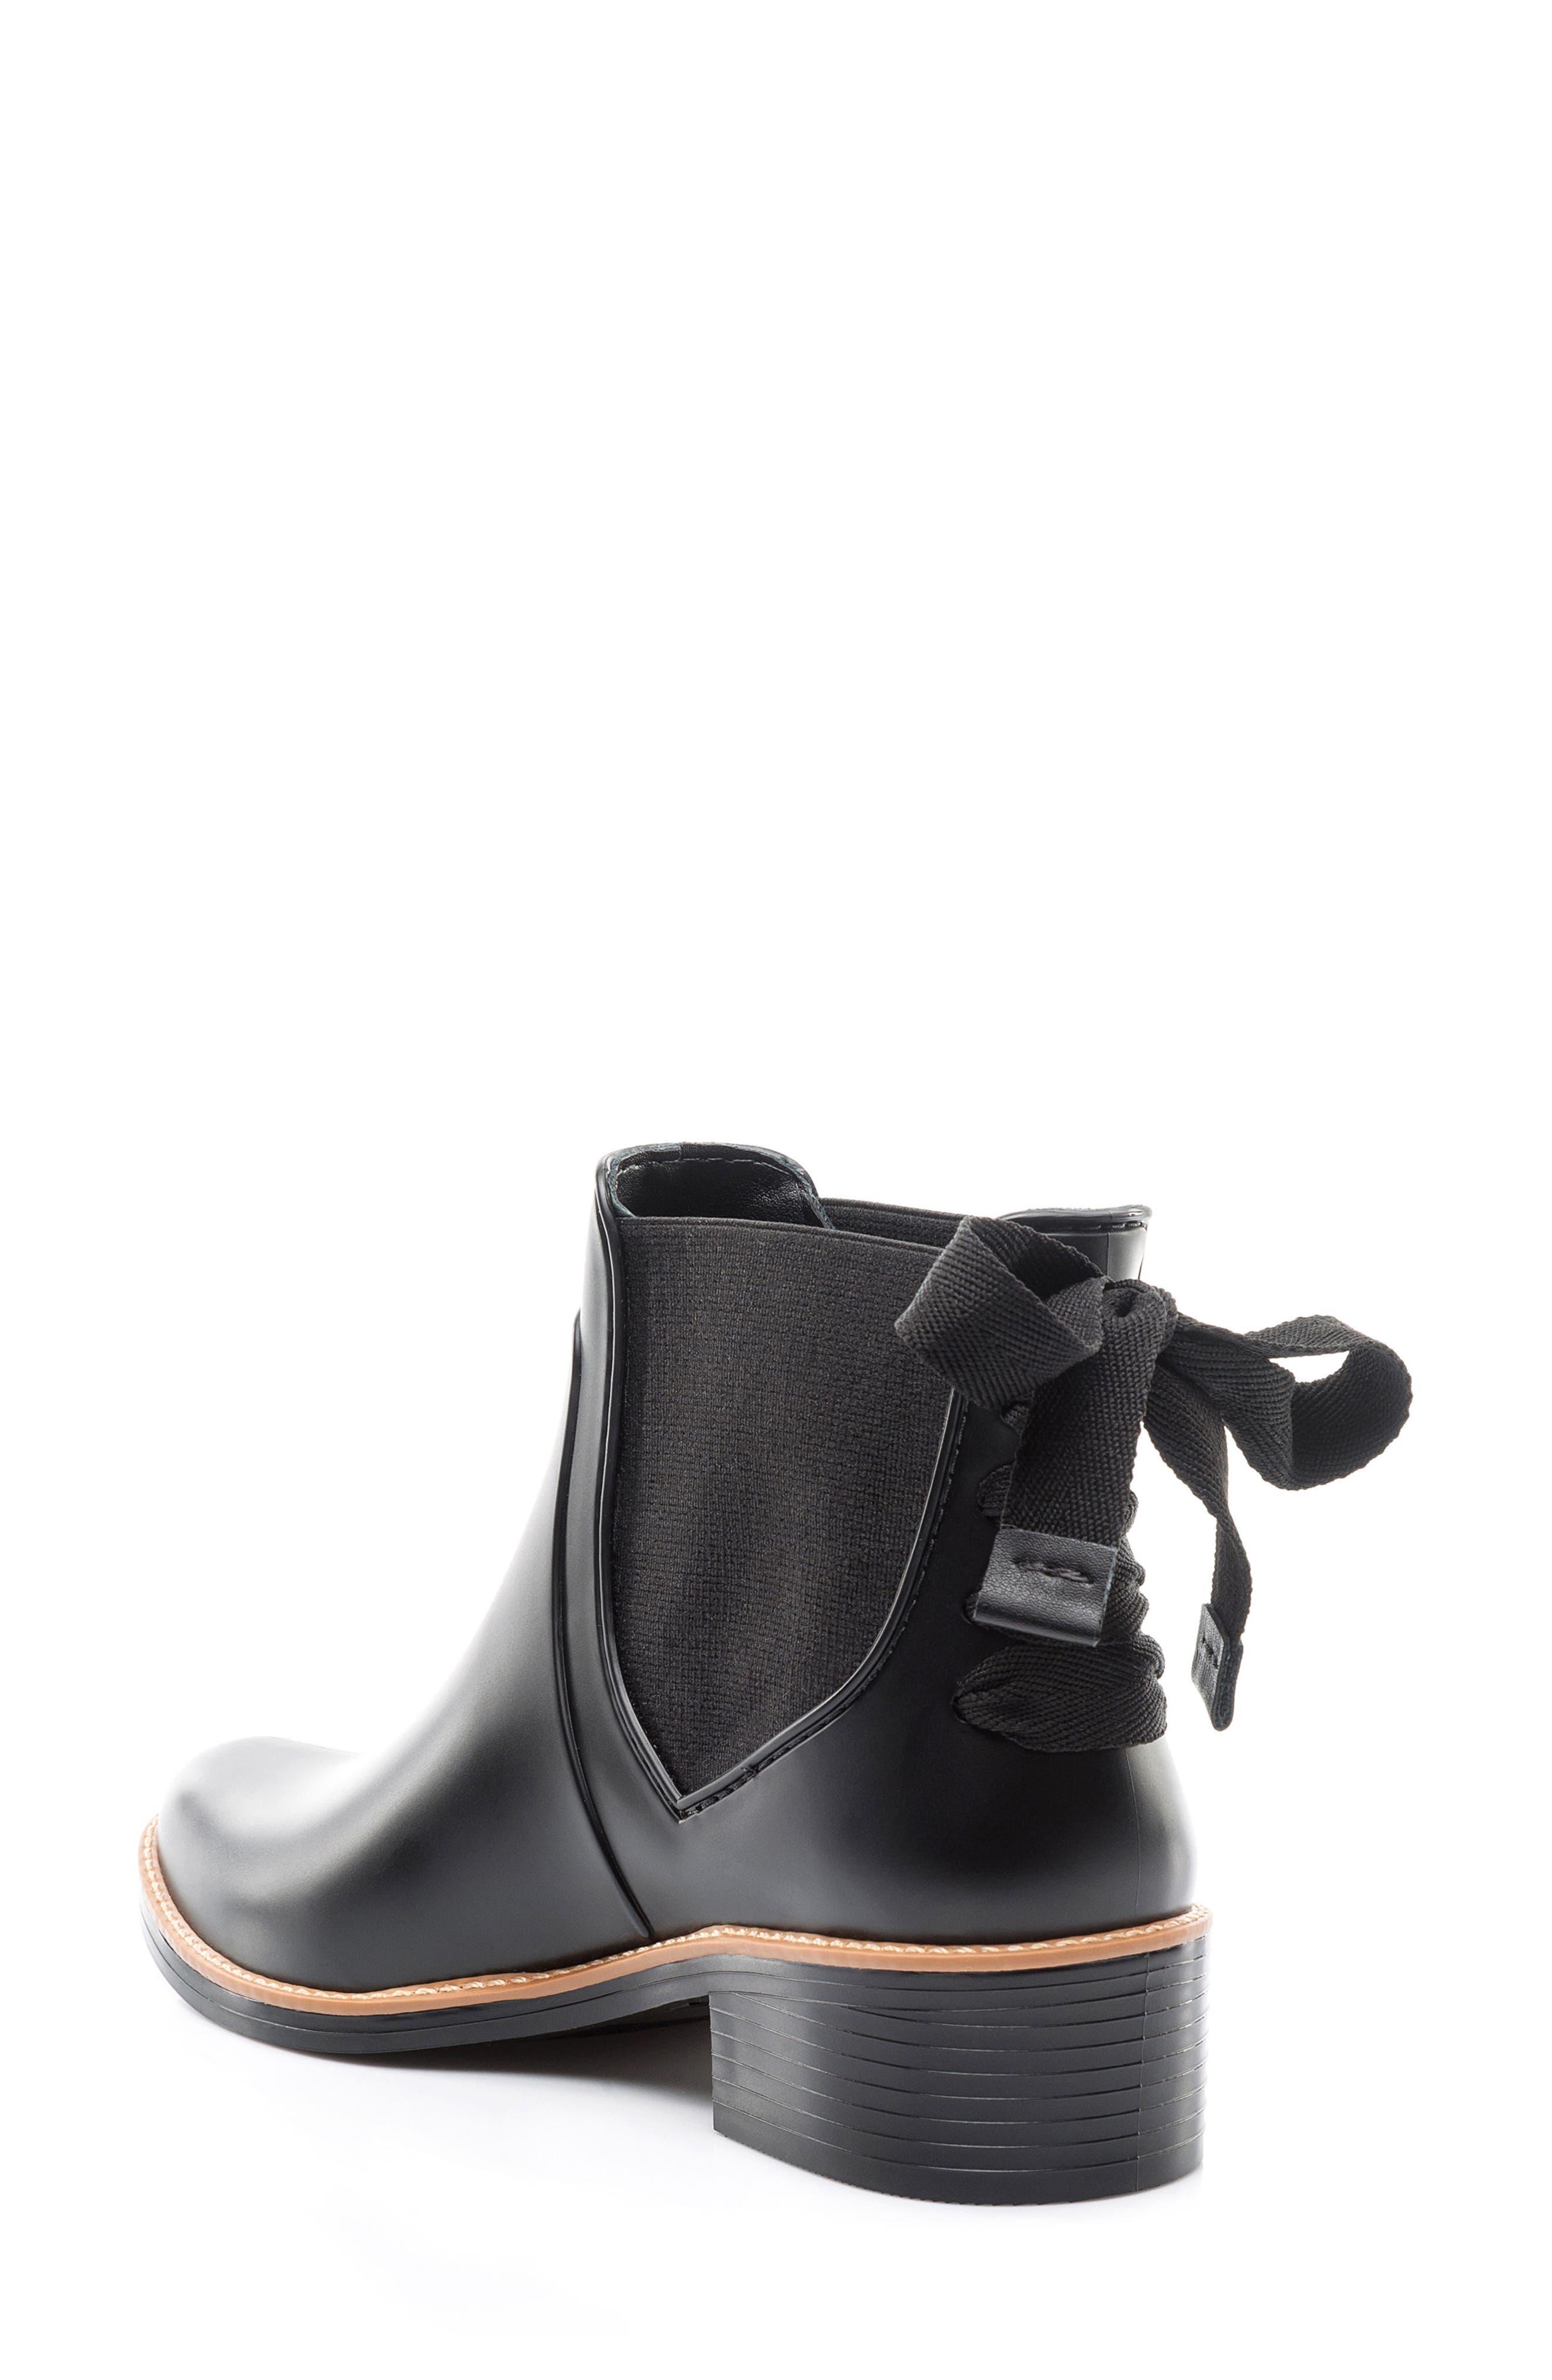 BERNARDO, Paxton Waterproof Rain Boot, Alternate thumbnail 2, color, BLACK